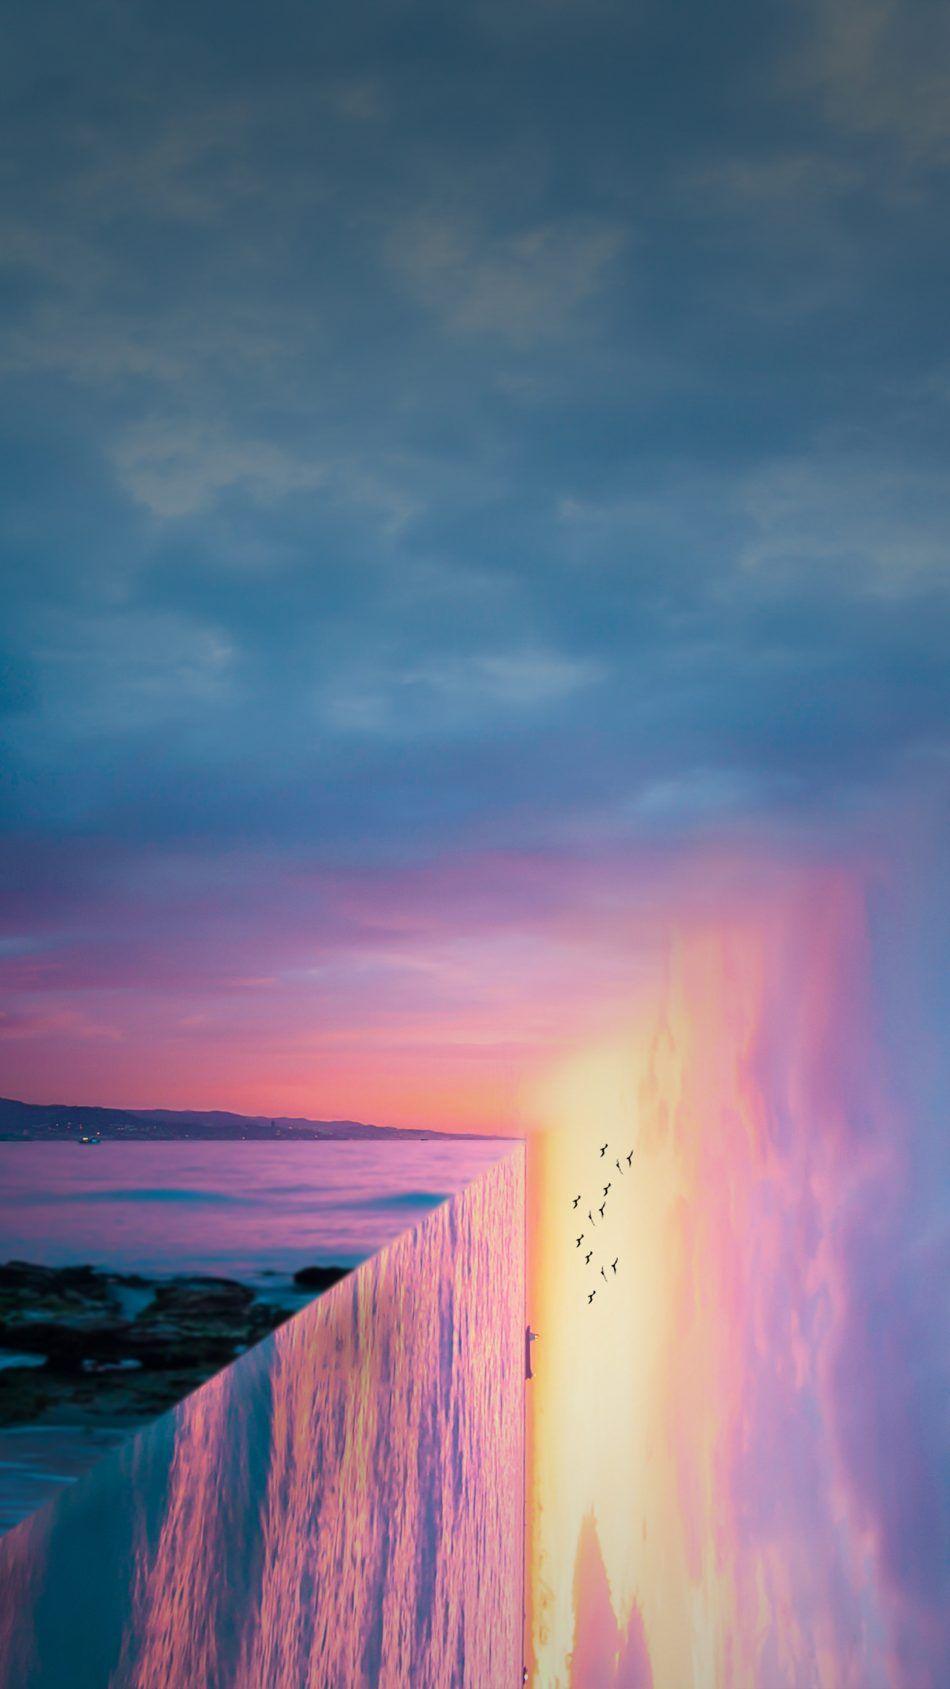 Sunset Sea Reflection Art 4k Ultra Hd Mobile Wallpaper Reflection Art Sunset Sea Mobile Wallpaper